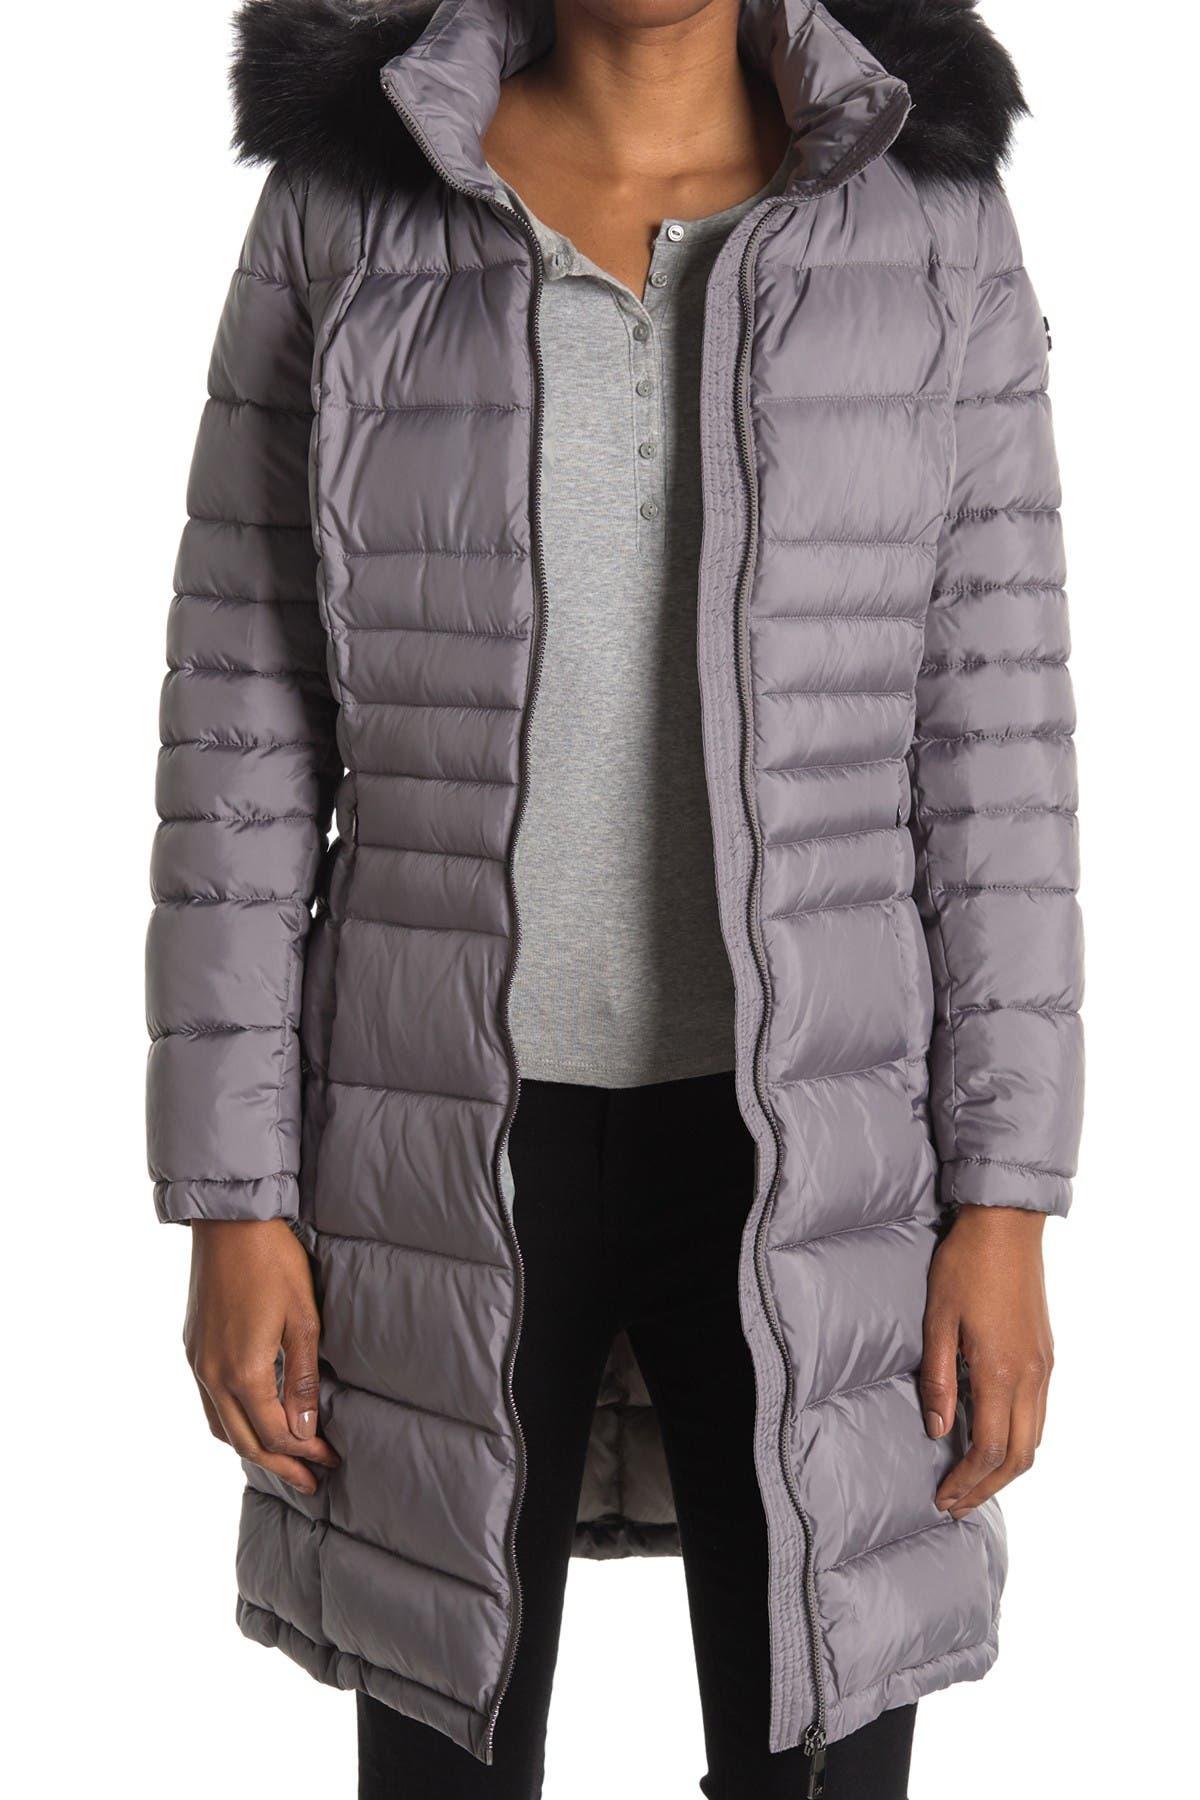 Image of Calvin Klein Faux Fur Trimmed Hood Walker Puffer Jacket